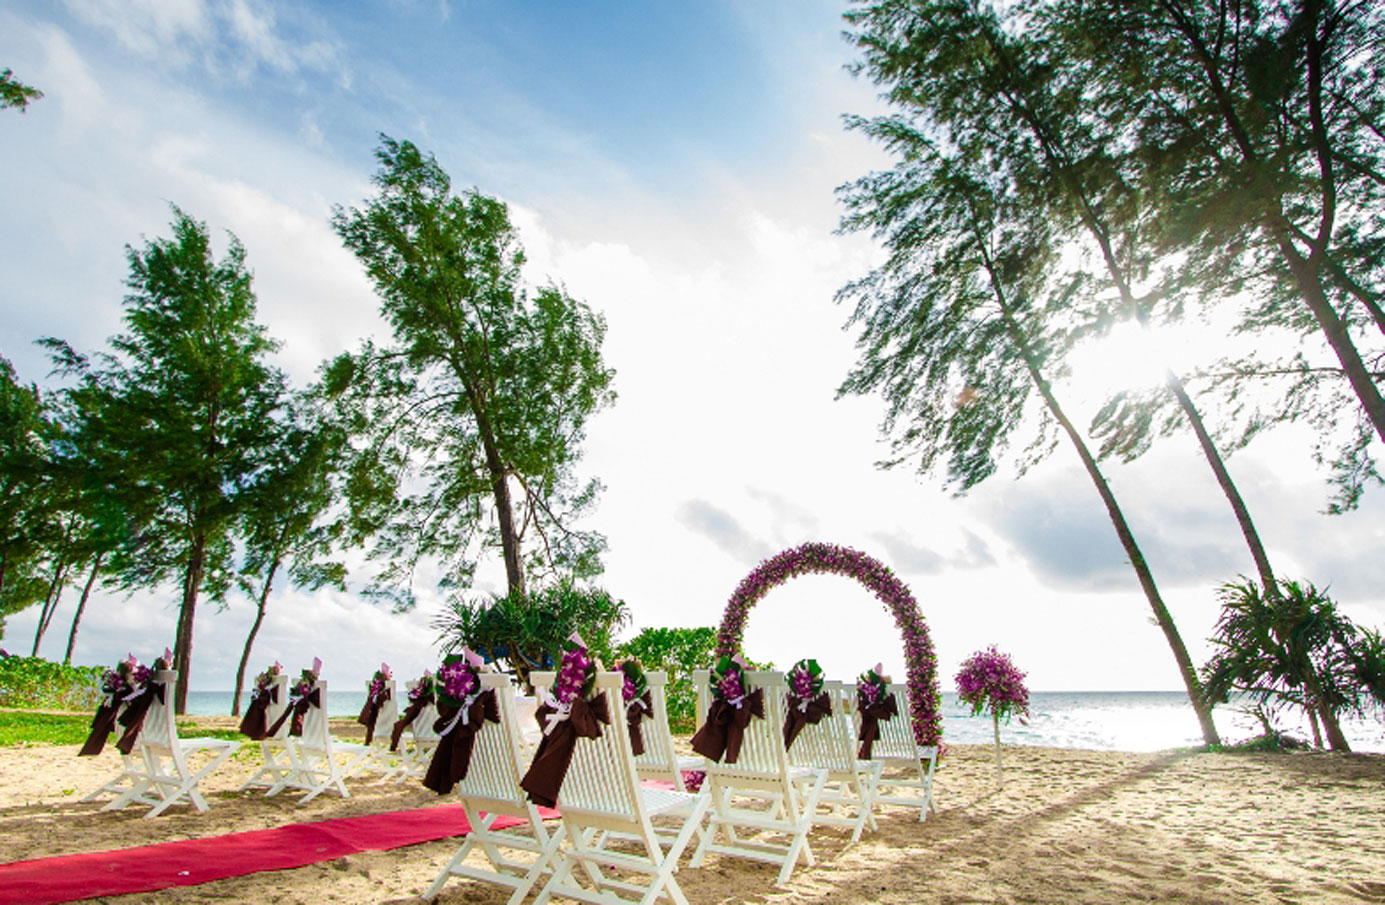 Beach-Wedding-at-JW-Marriott-Phuket_09